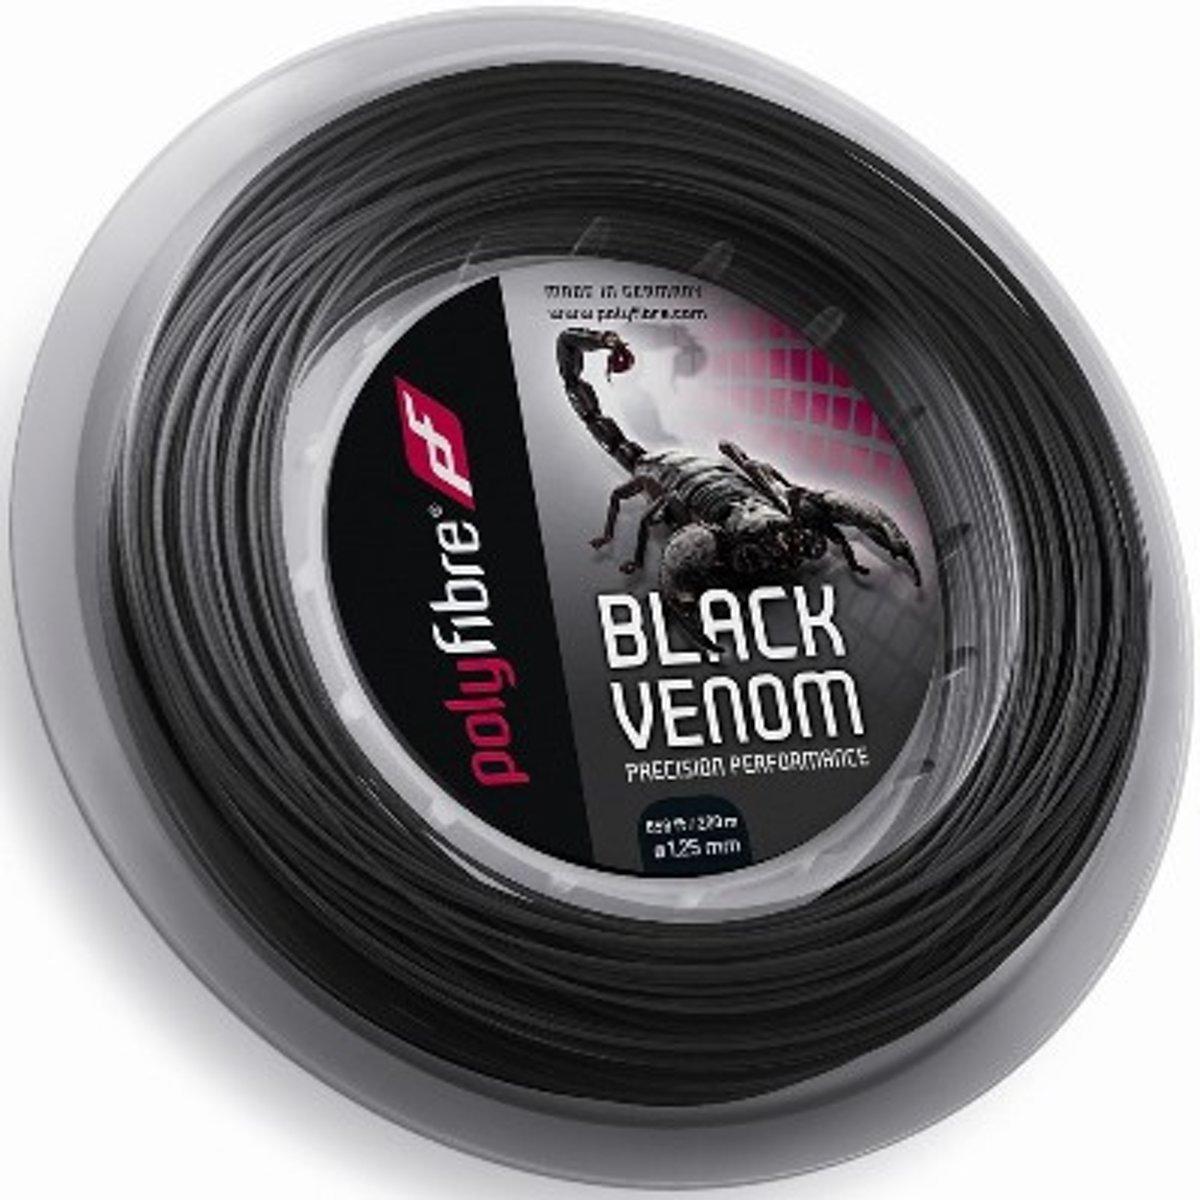 Polyfibre Black Venom 200 m. tennissnaar 1.20 mm. kopen